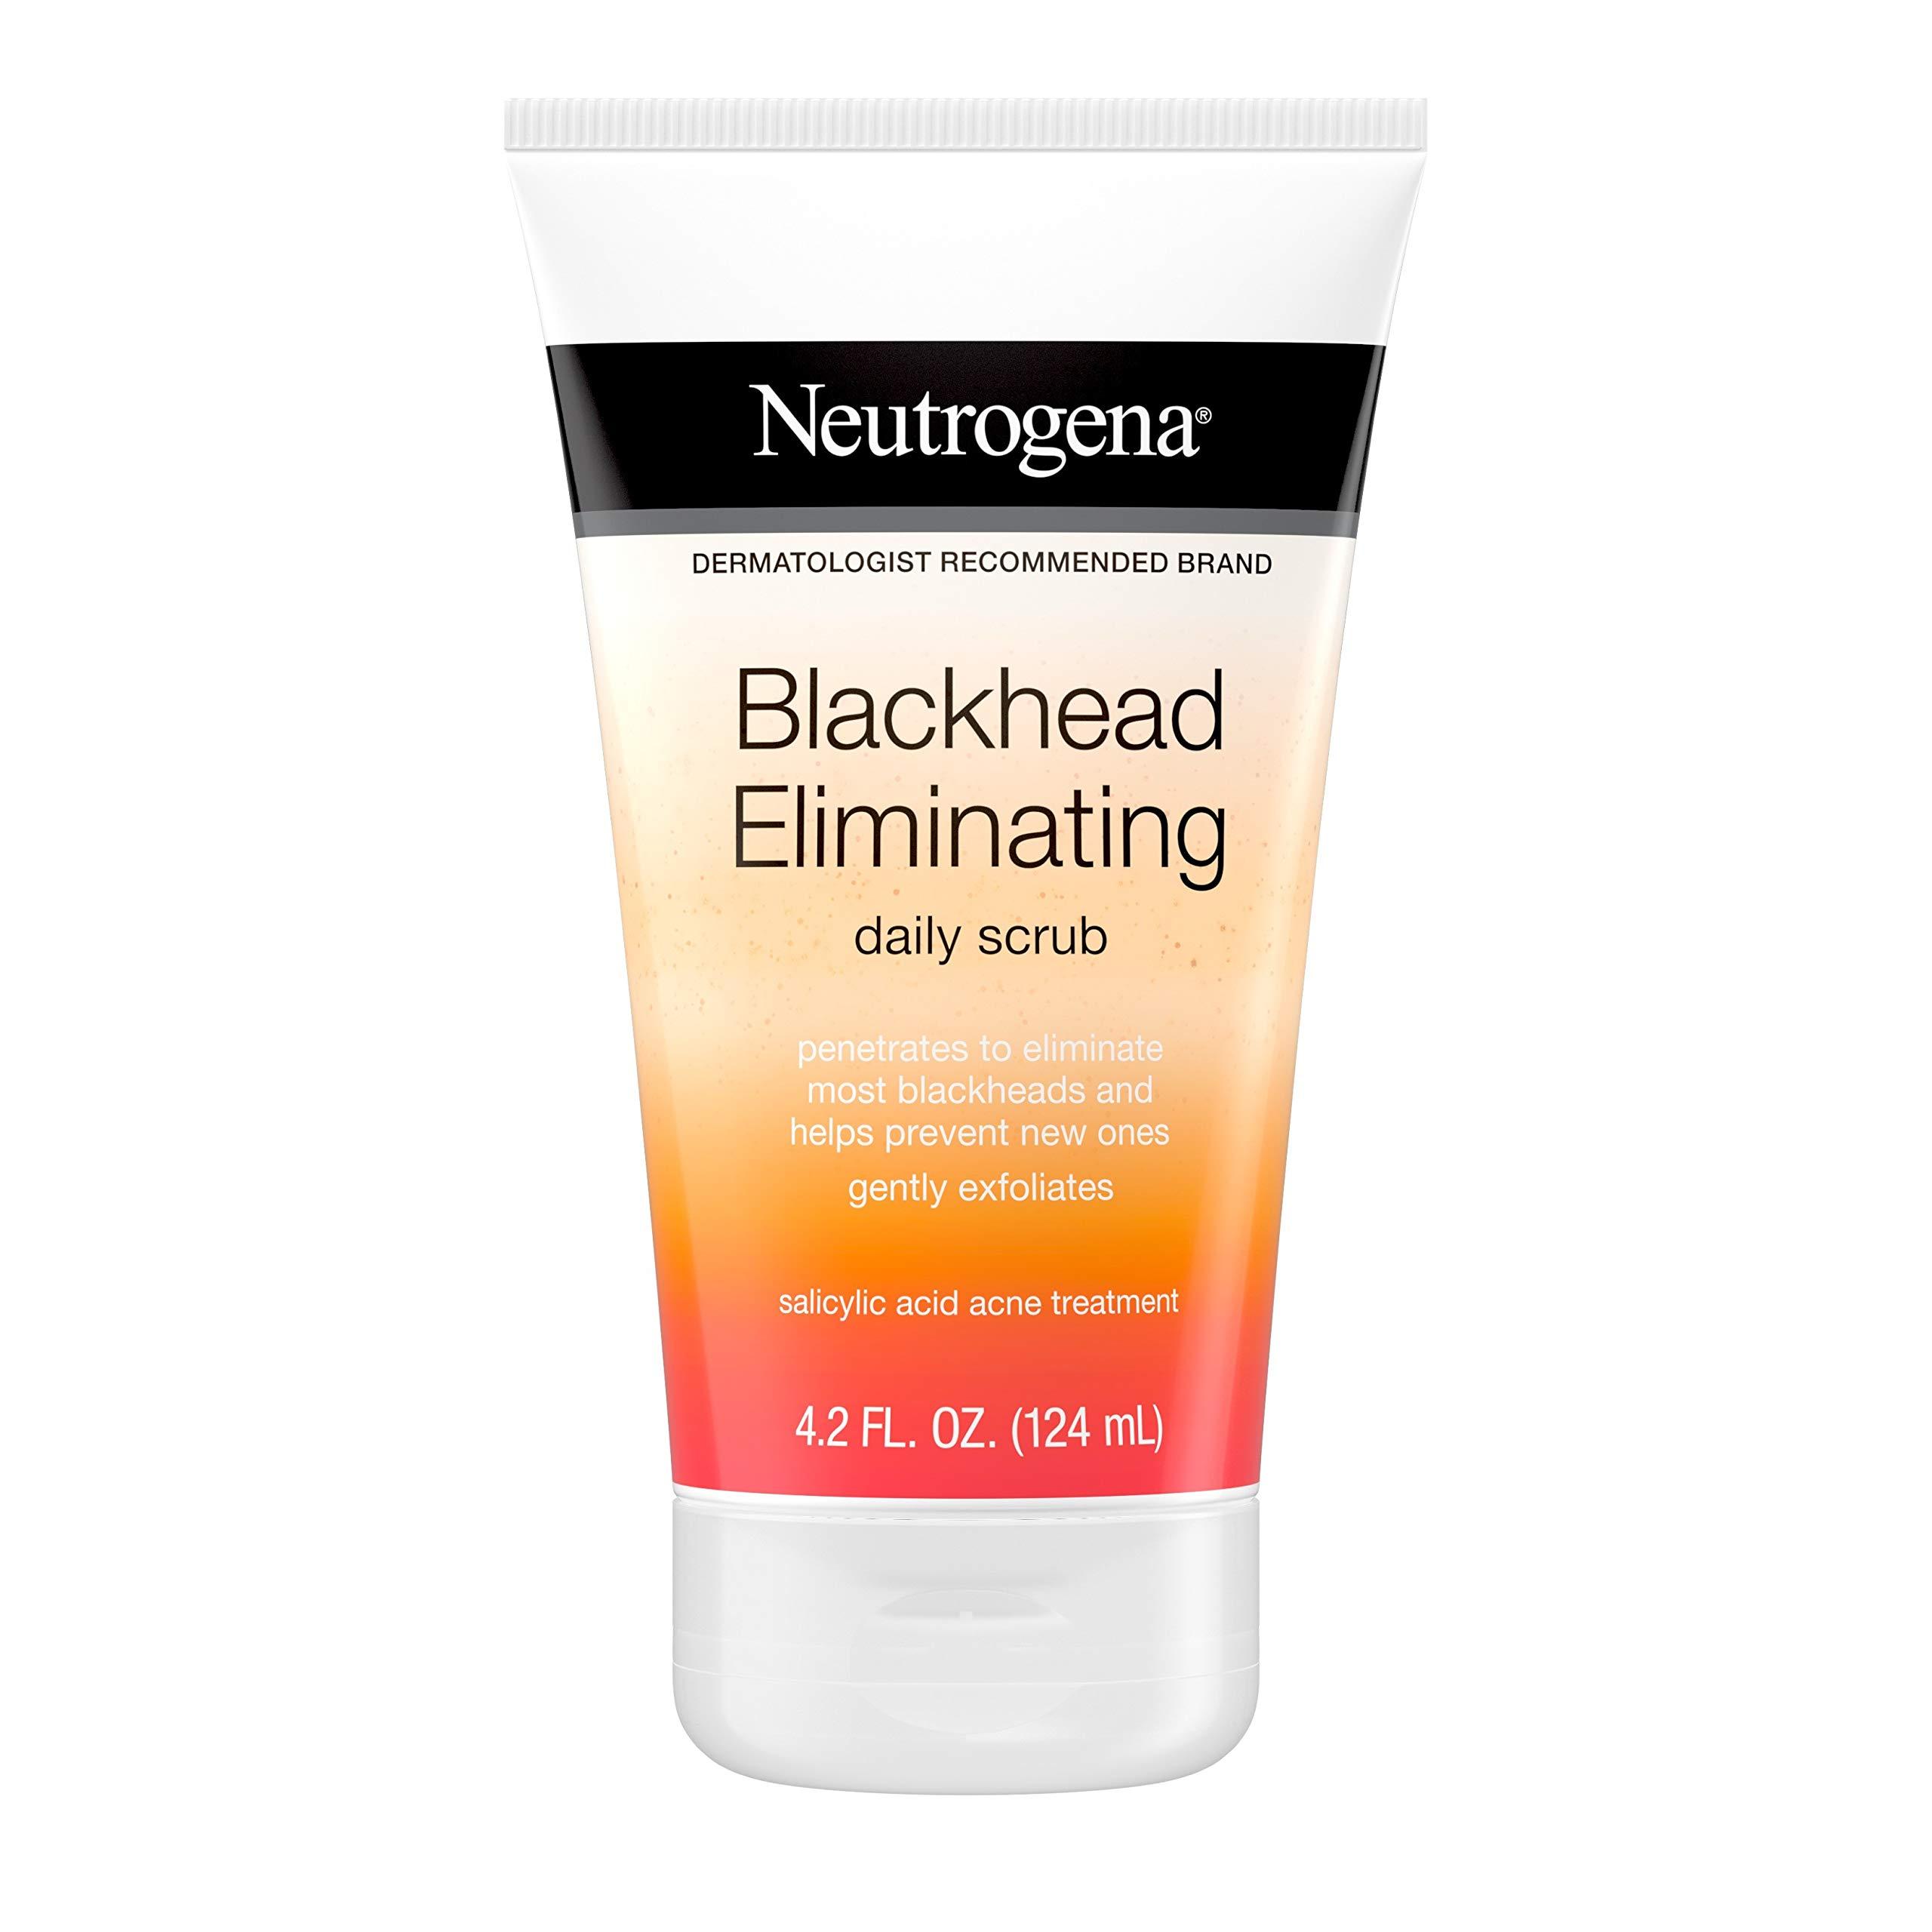 Neutrogena Blackhead Eliminating Daily Facial Scrub With Salicylic Acid Acne Medicine, Exfoliating Face Wash for Blackheads, 4.2 oz (Pack of 6)